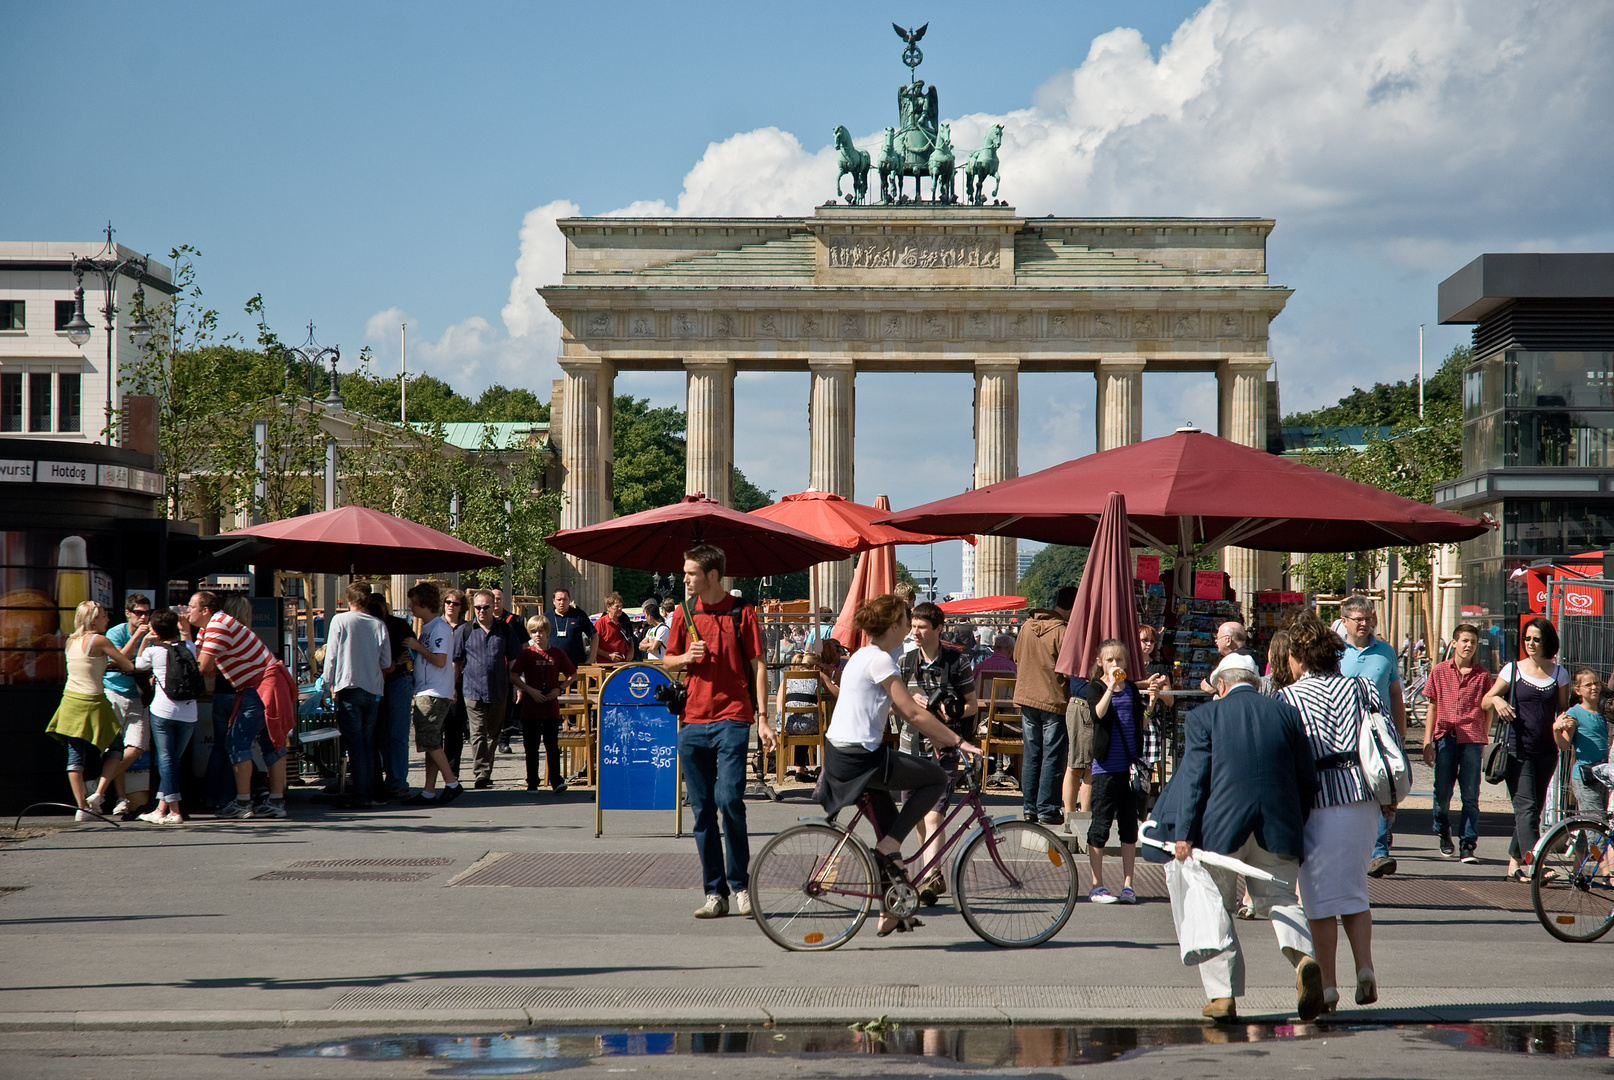 Dynamik am Brandenburger Tor